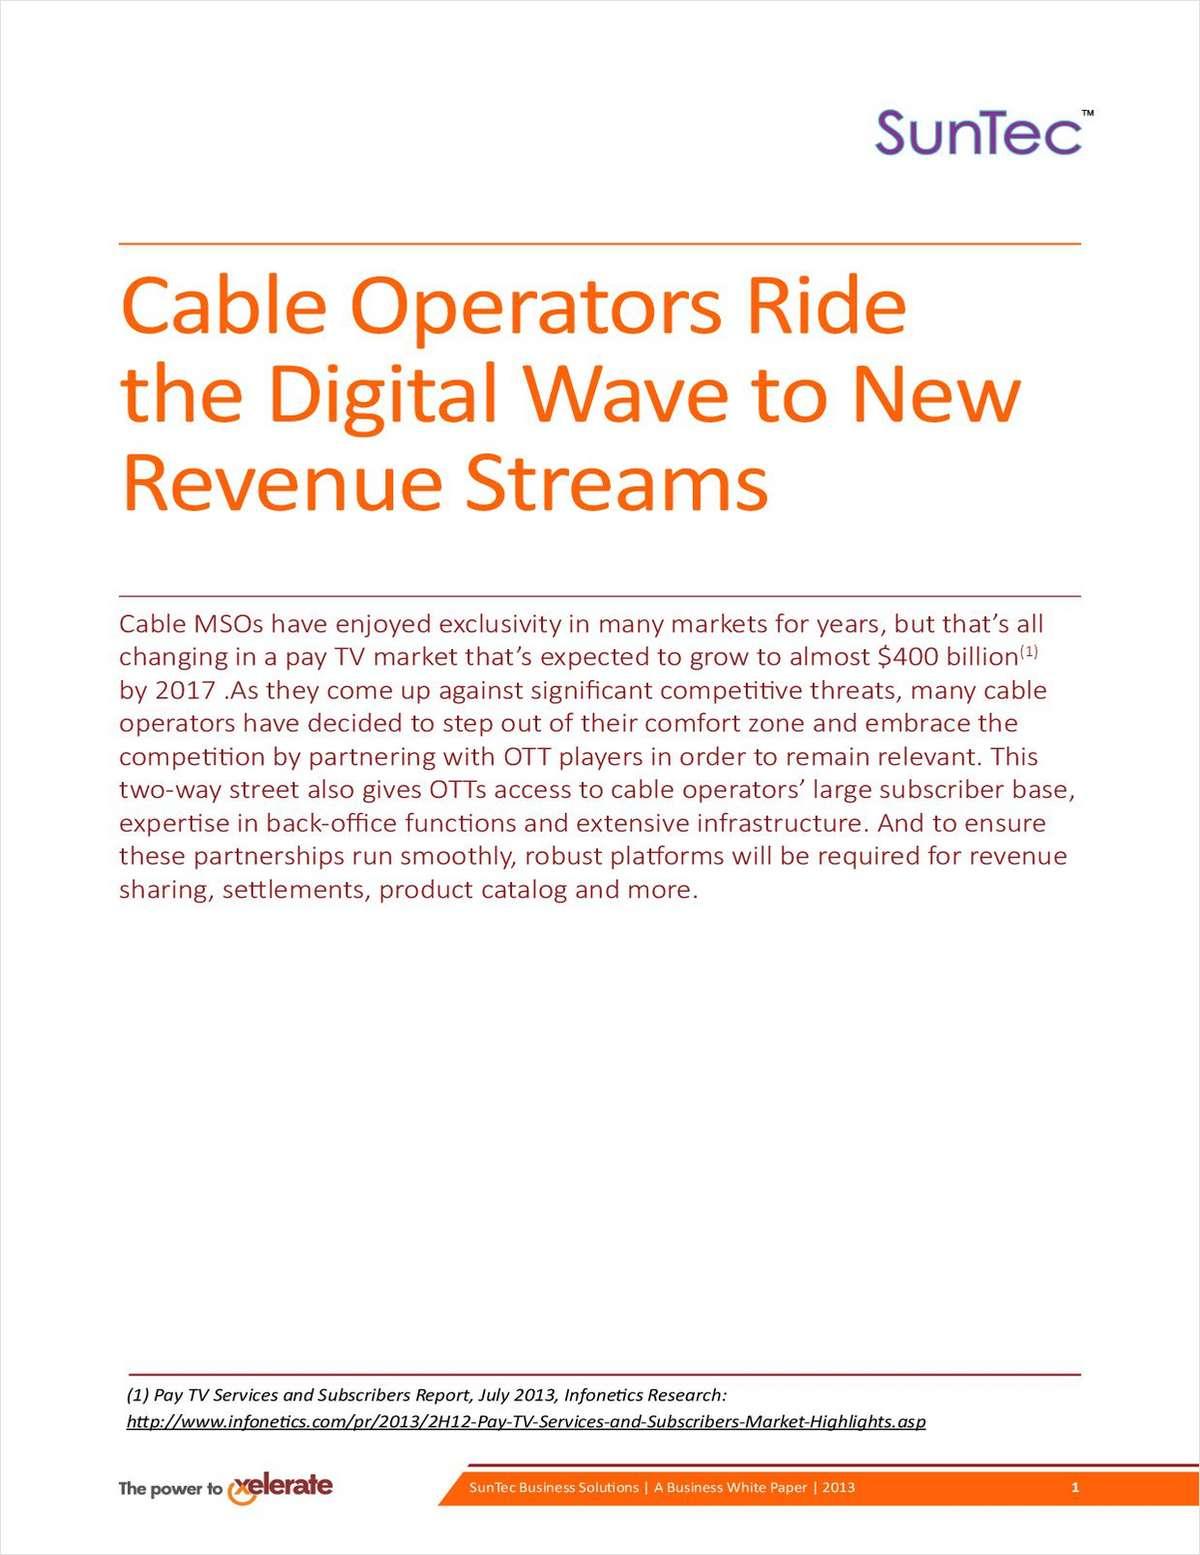 Cable Operators Ride the Digital Wave to New Revenue Streams